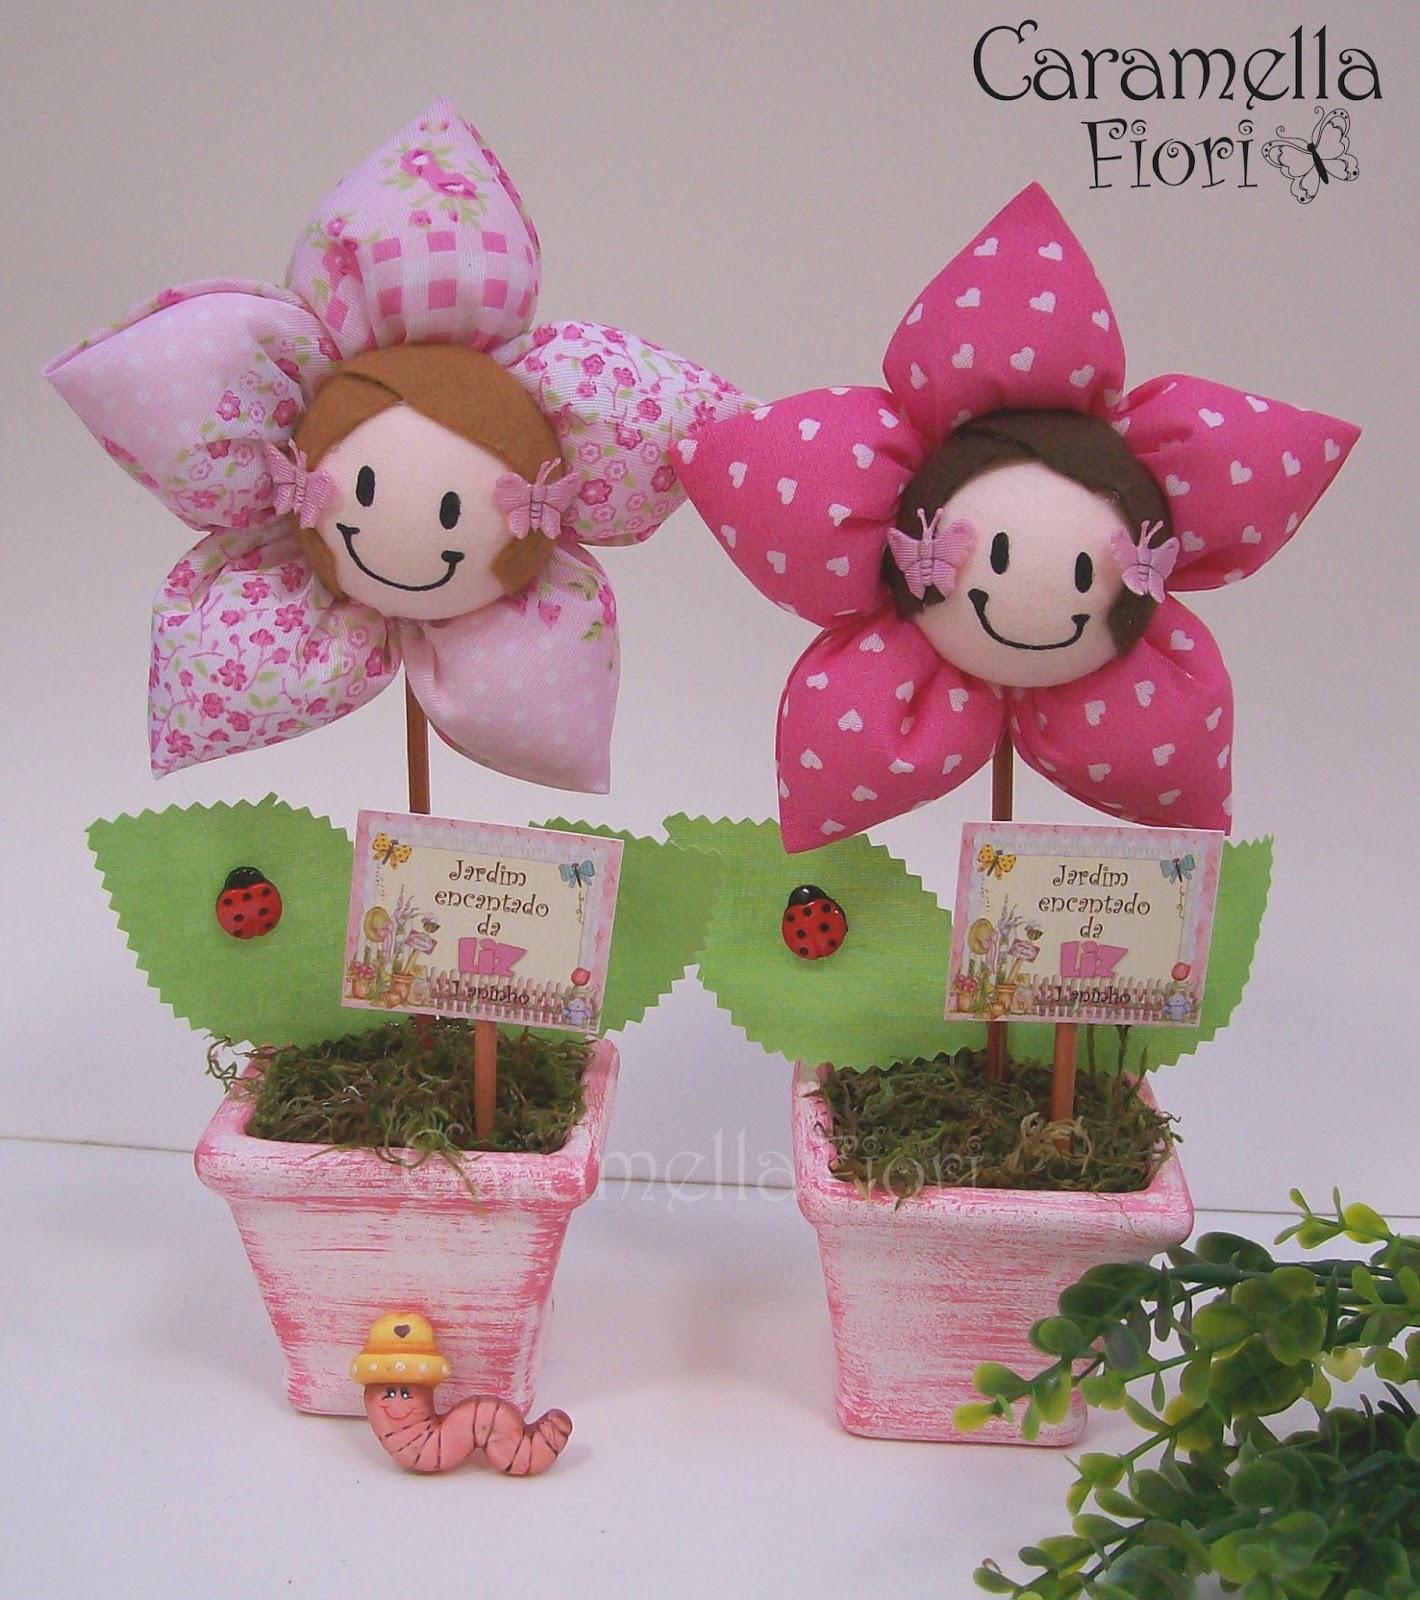 enfeite de mesa aniversario jardim encantado:Caramella Fiori: Vaso Flor Carinha de Menina